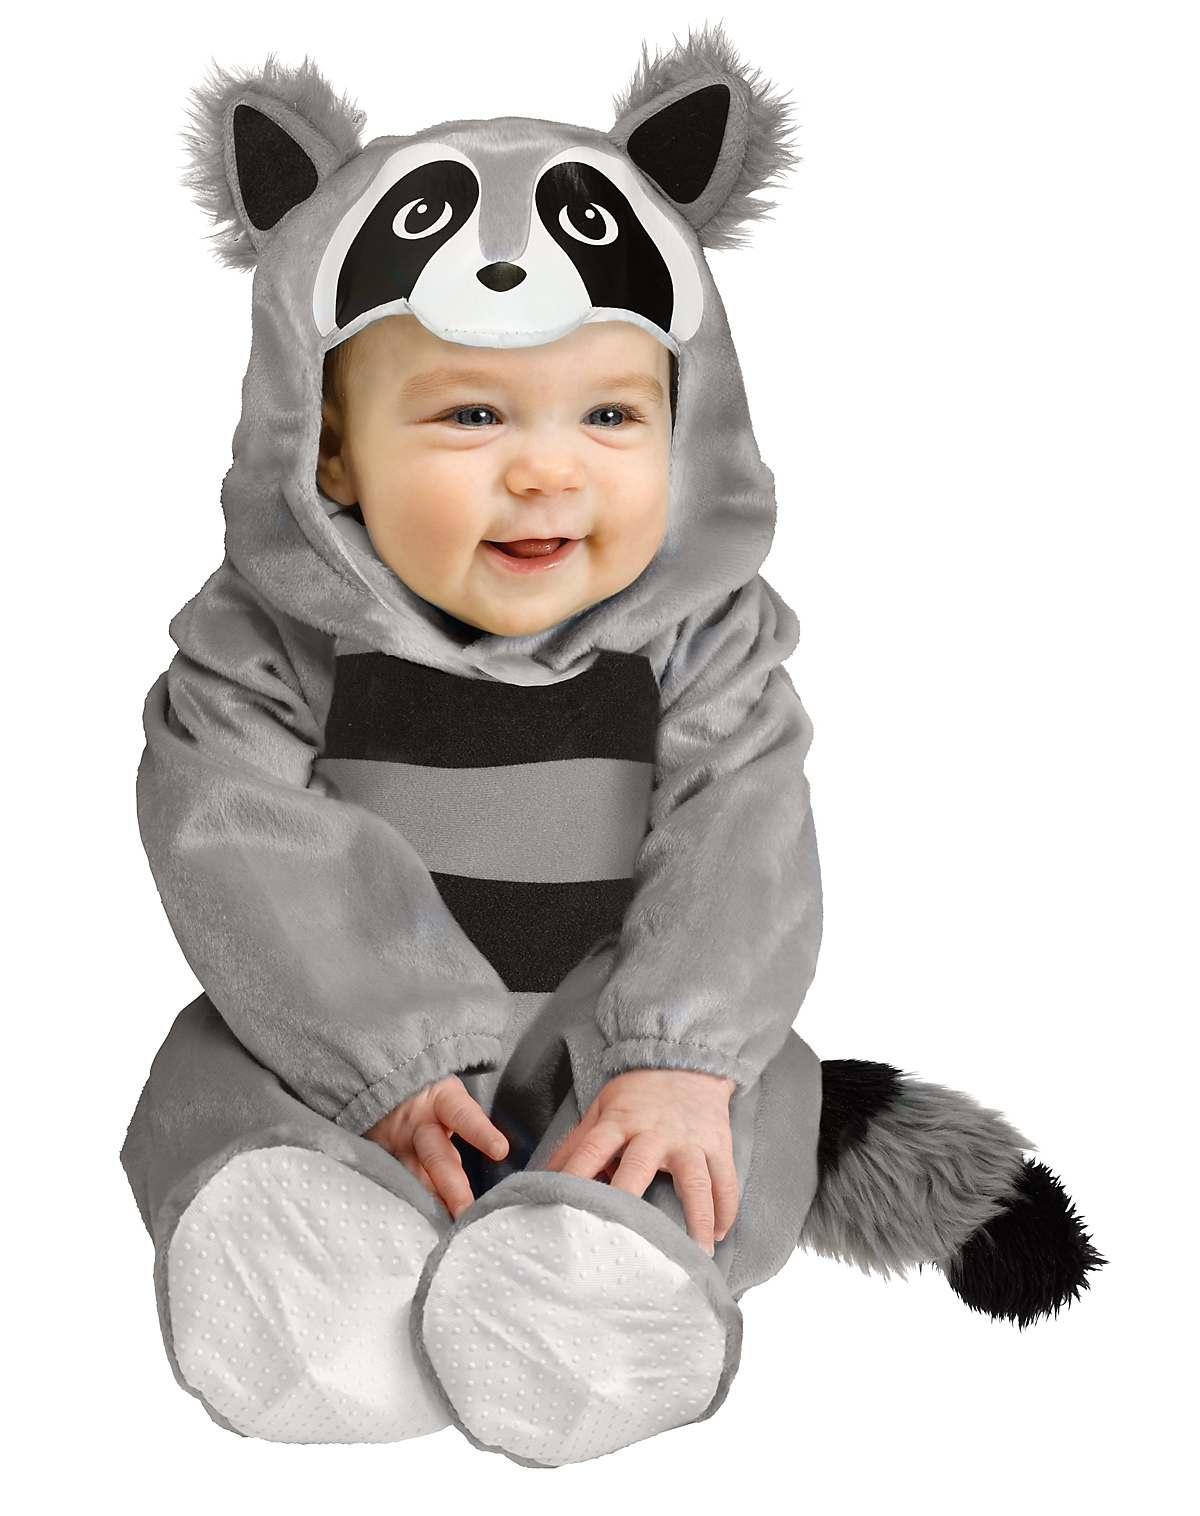 baby's first halloween costume ideas – spirit halloween blog